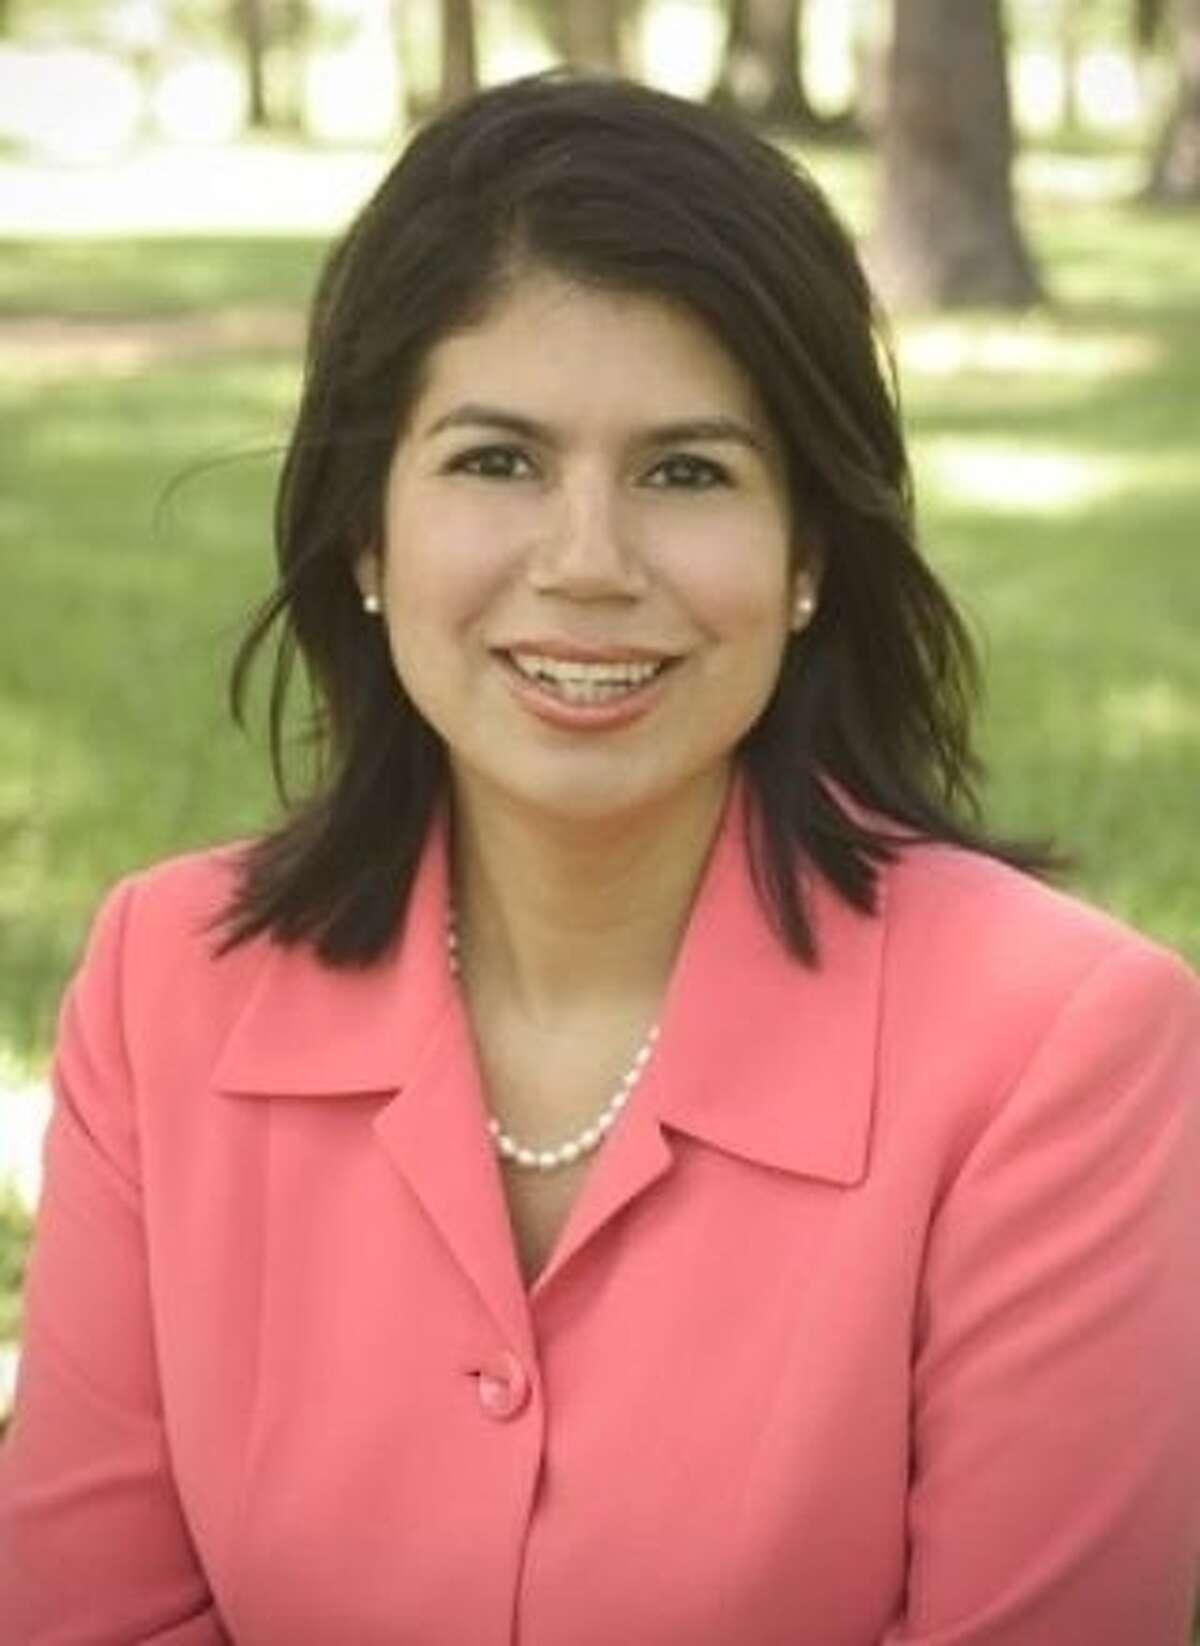 Carol Alvarado, State Representative. For Nancy Sarnoff story on KBR's property in the East End.